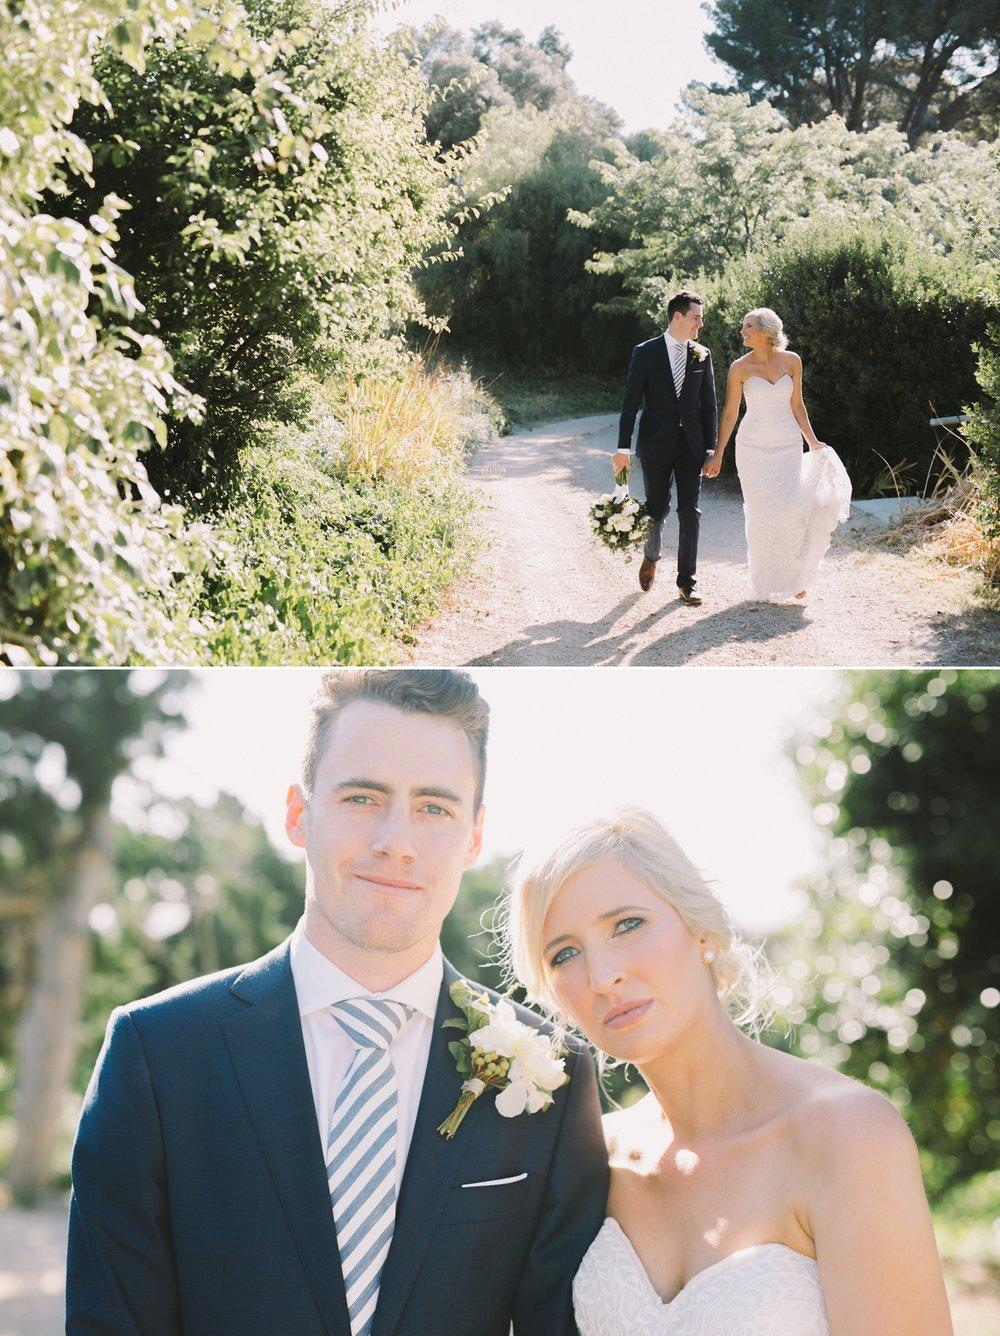 Lauren & Max - Marybank Estate Wedding - Natural wedding photographer in Adelaide - www.katherineschultzphotography.com 77